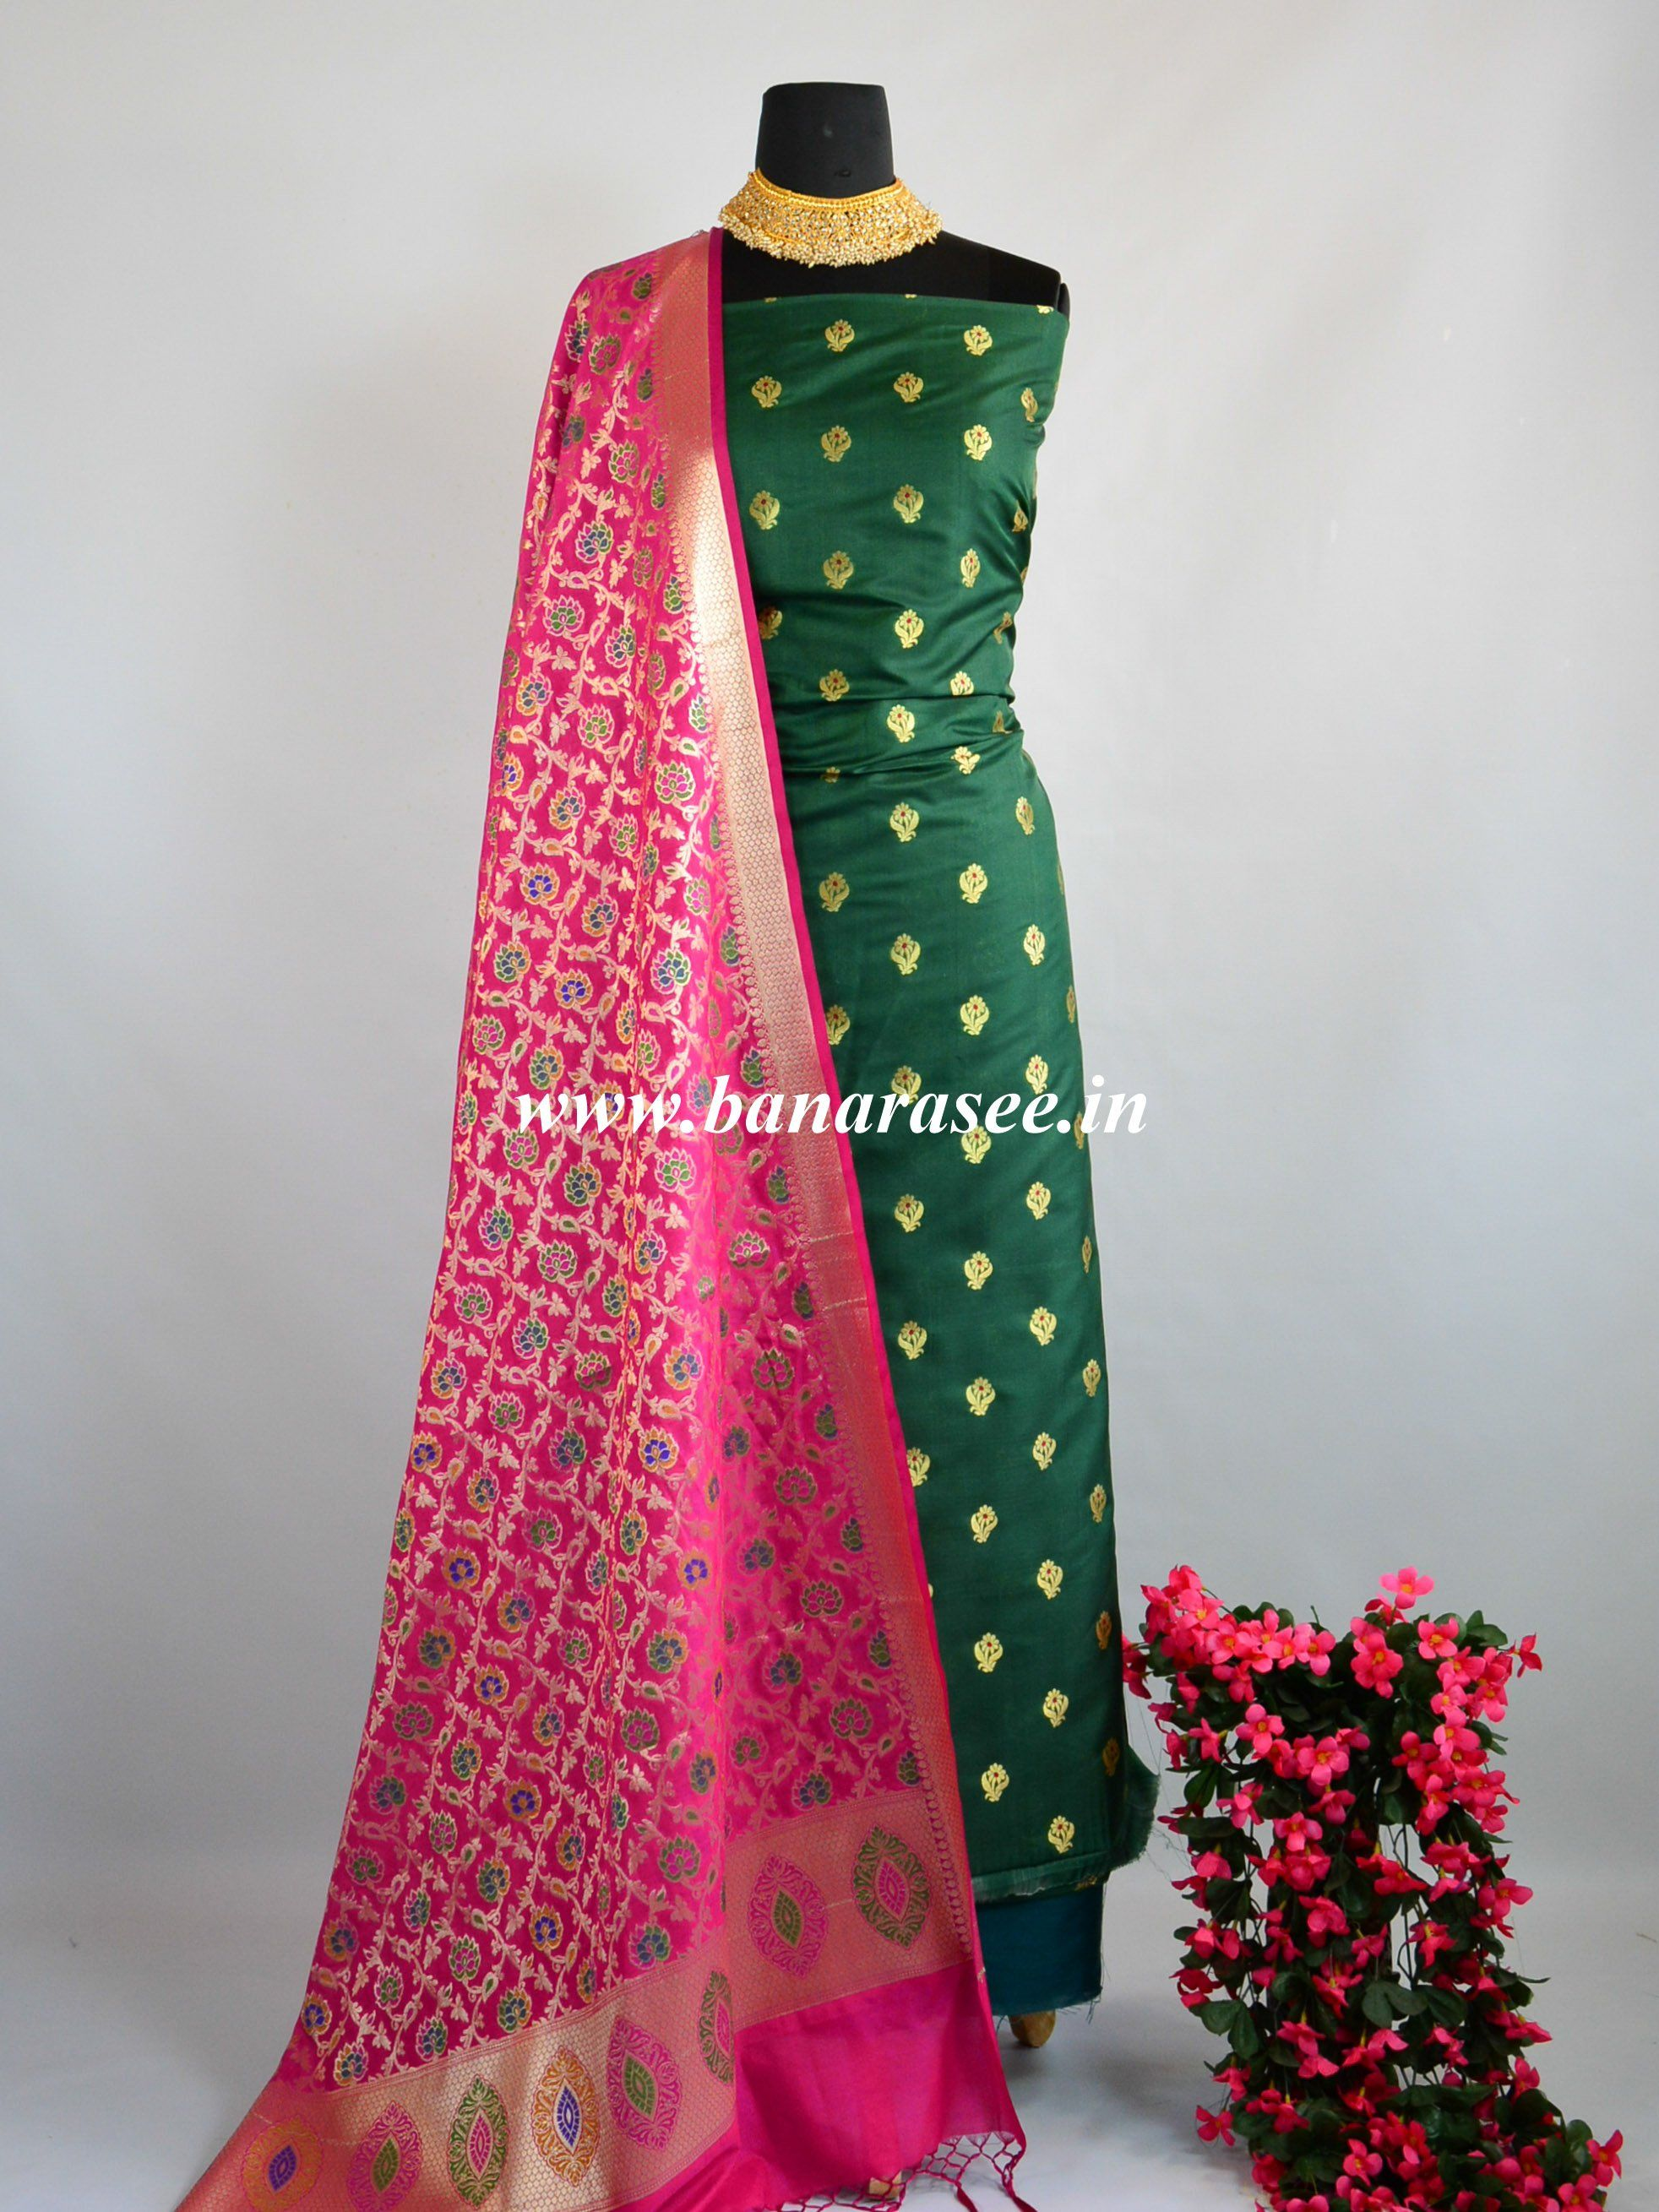 fd623c64250210 Salwar Kameez Semi Katan Silk Zari Buti Fabric With Contrast Dupatta ...